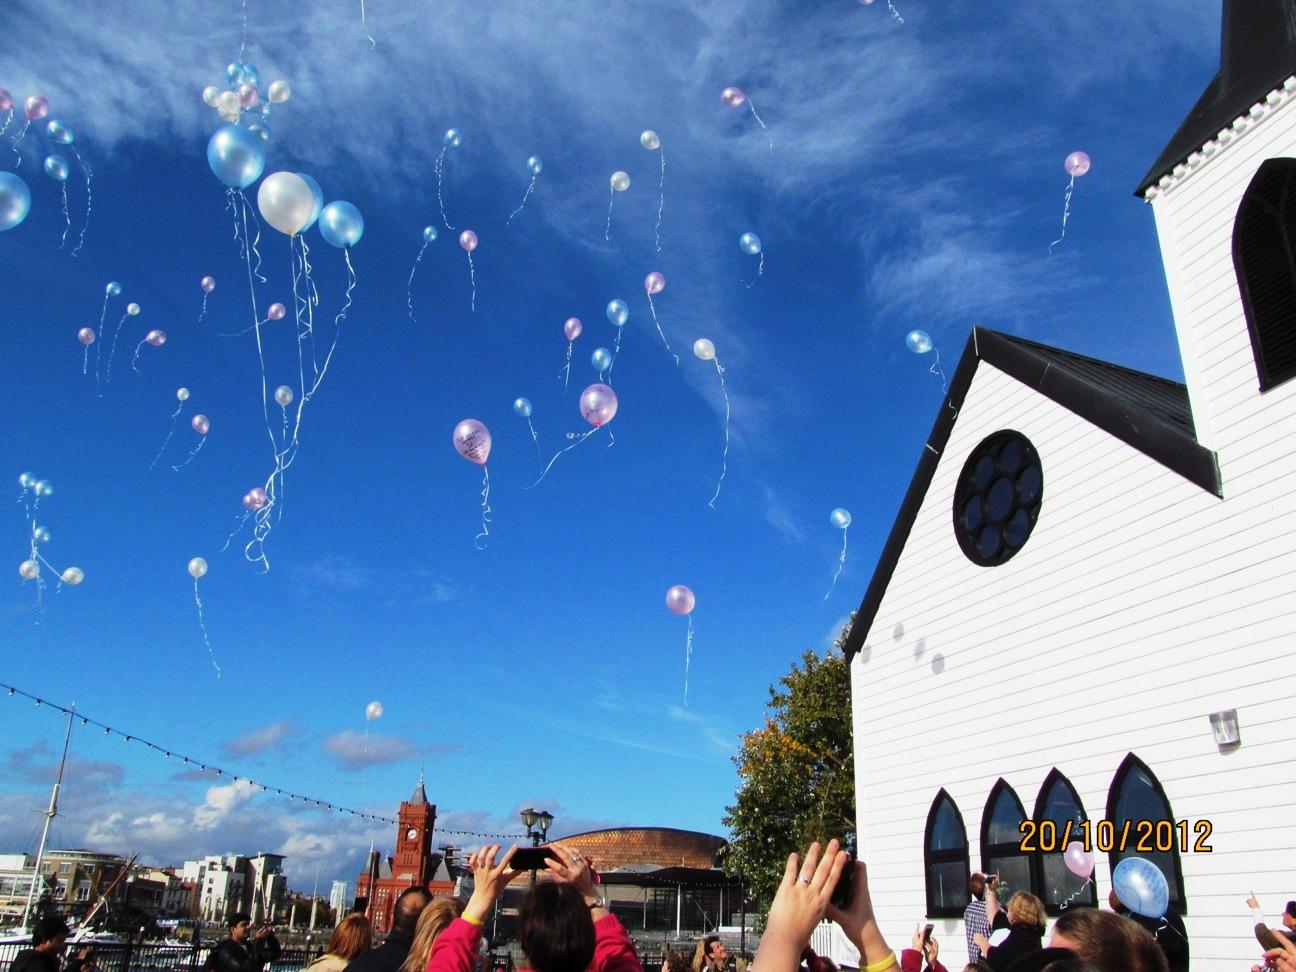 Balloon Release 2010